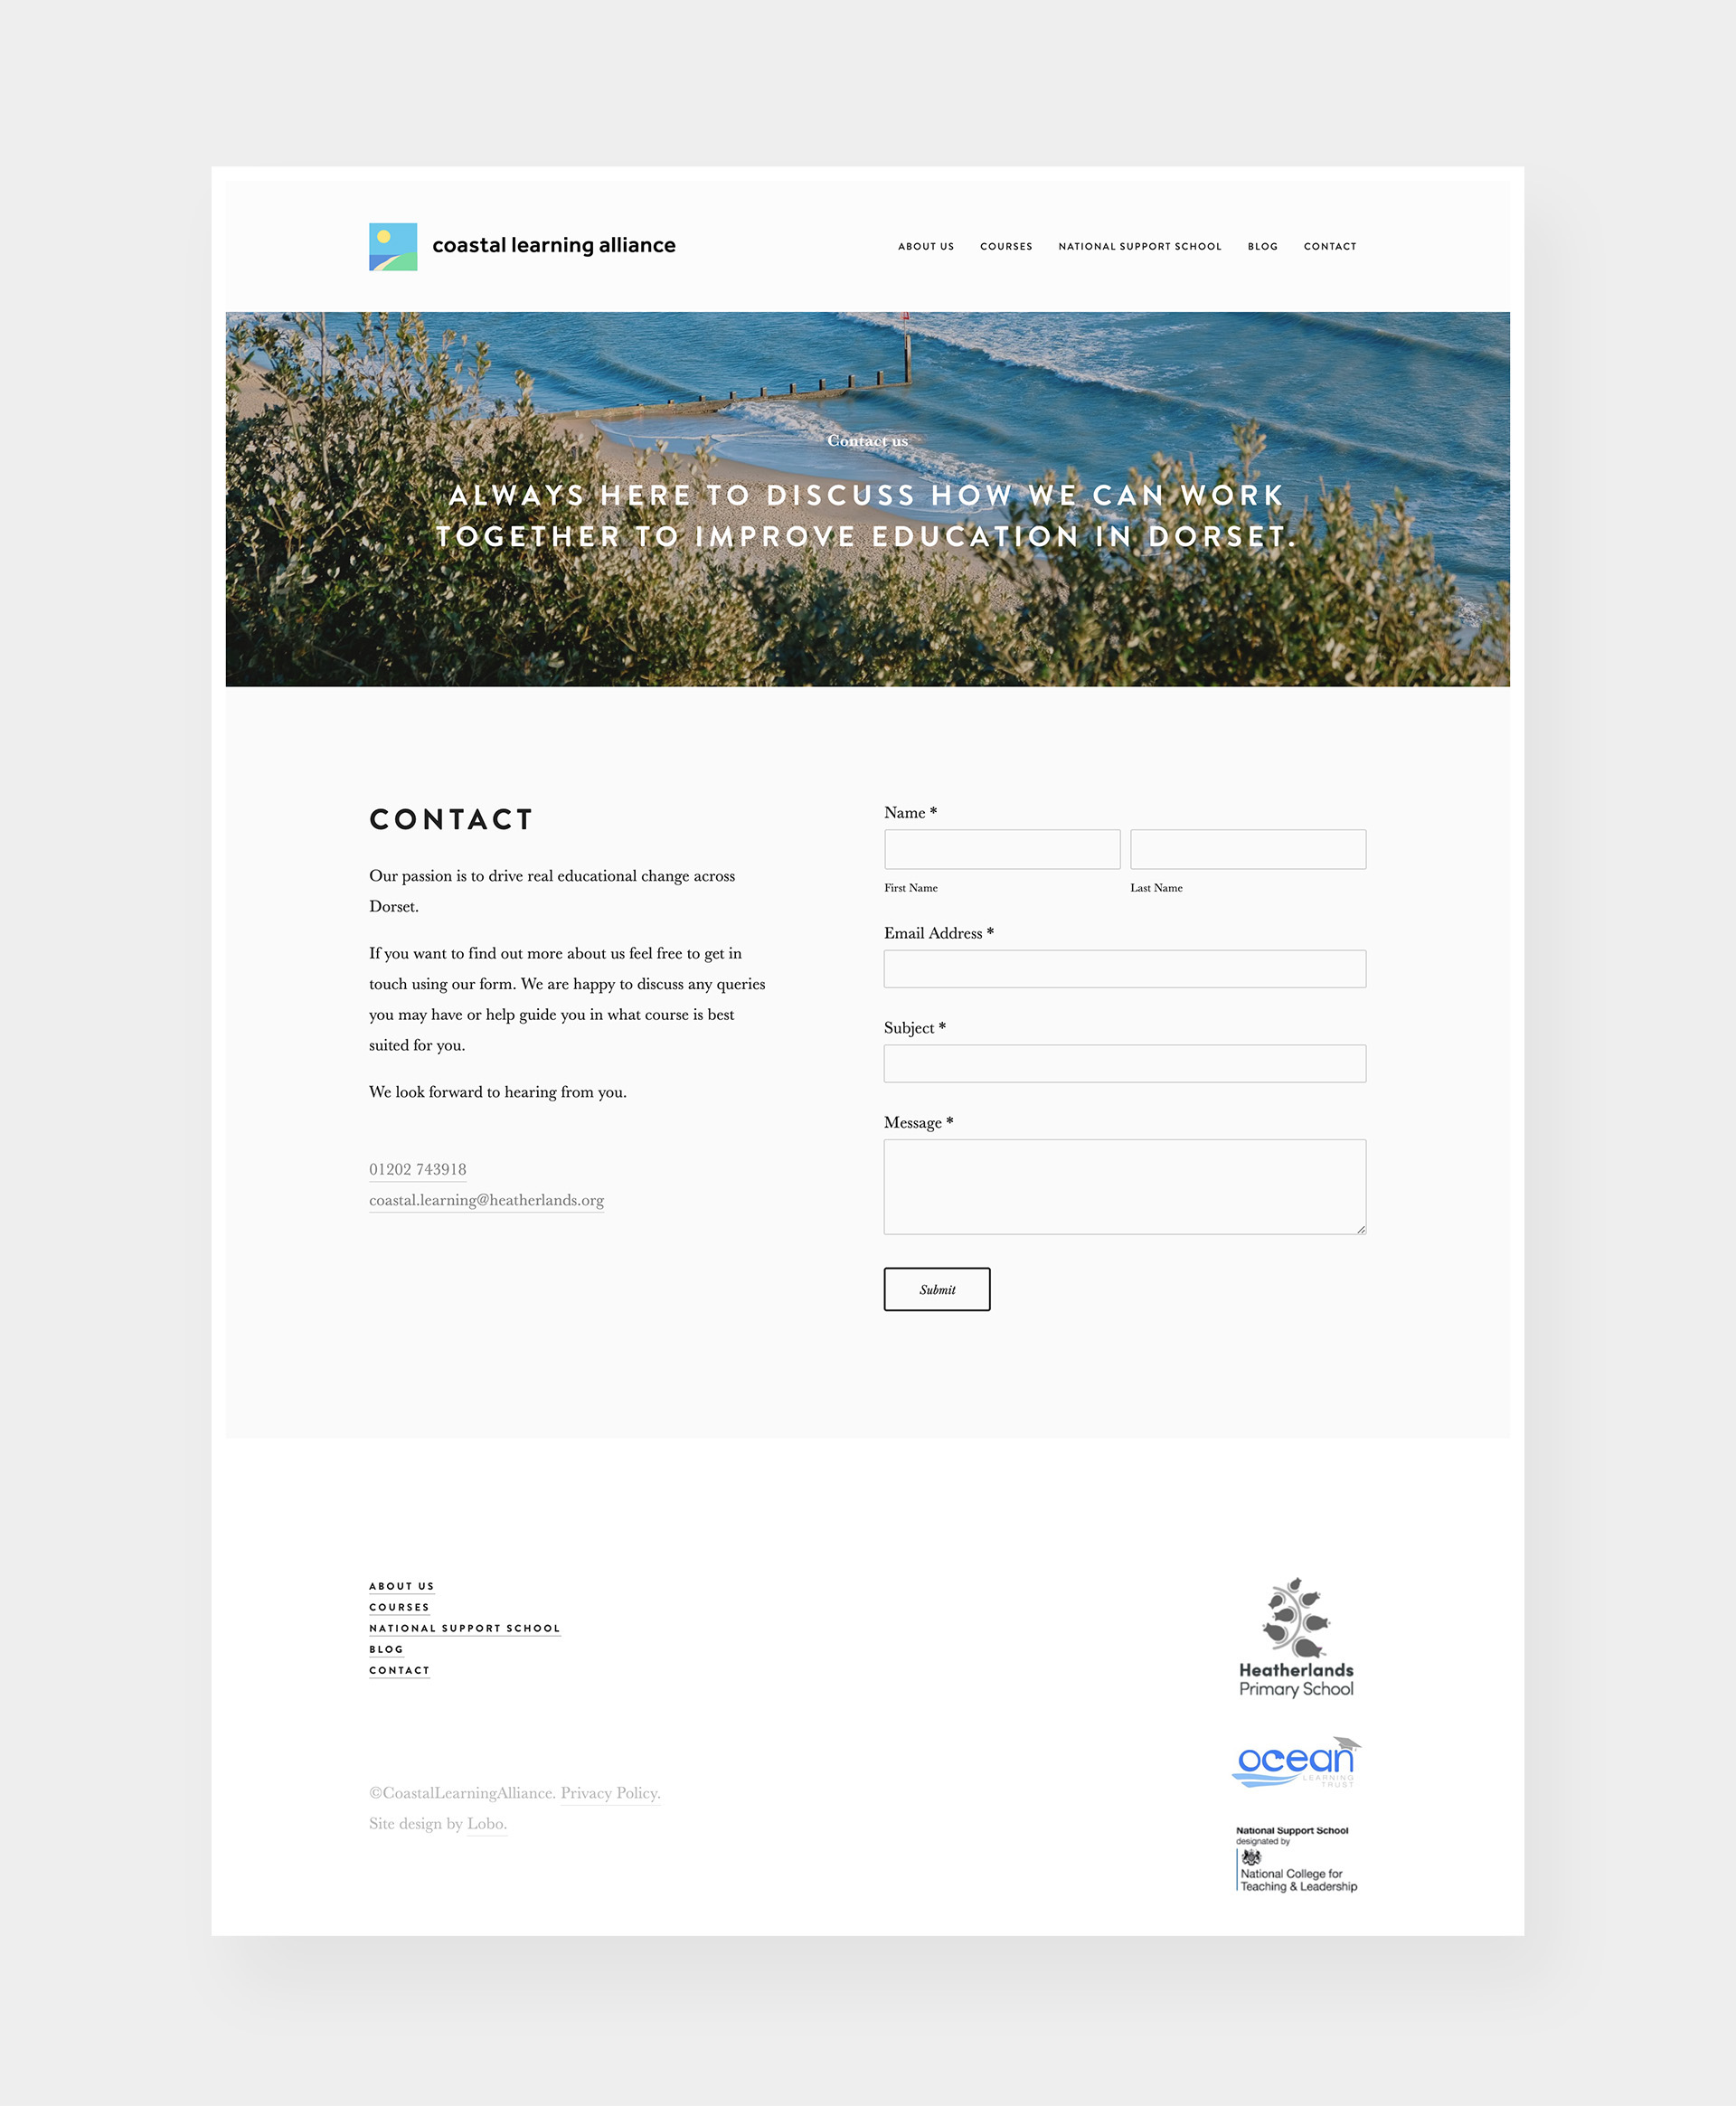 06-Lobo-Creative-Coastal-Learning-Alliance-website-digital-design-case-study.jpg